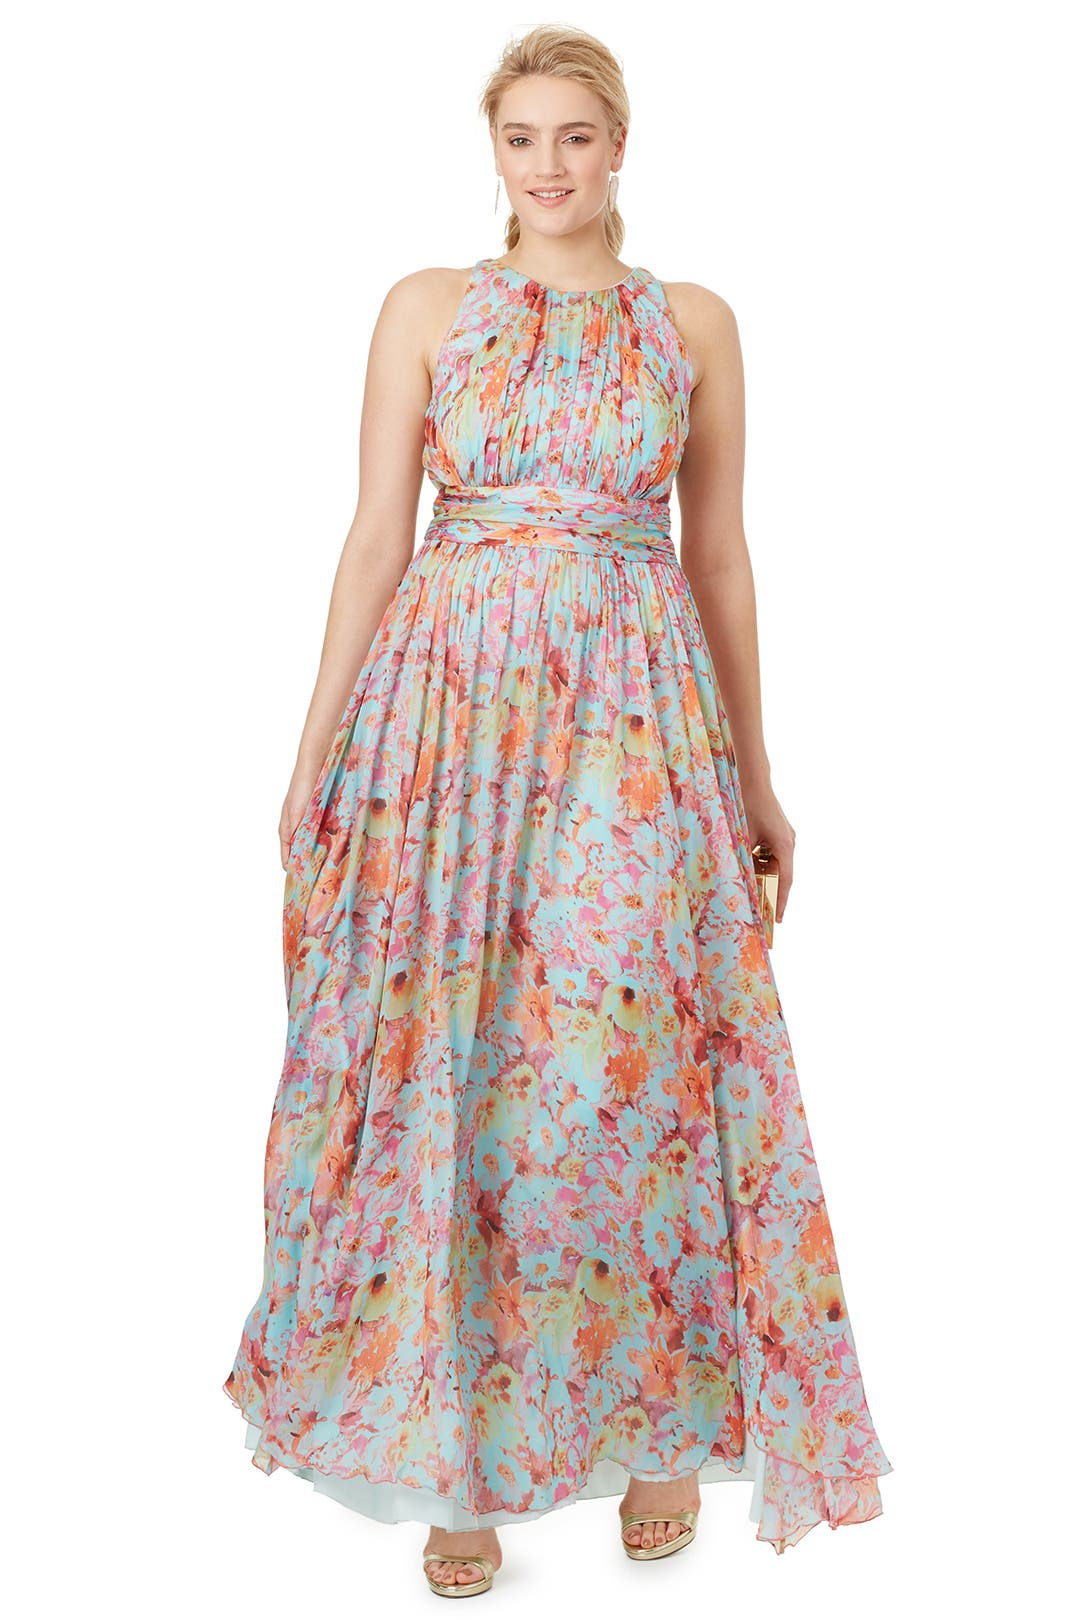 Wild Meadow Maxi Dress by Badgley Mischka for $165 | Rent the Runway